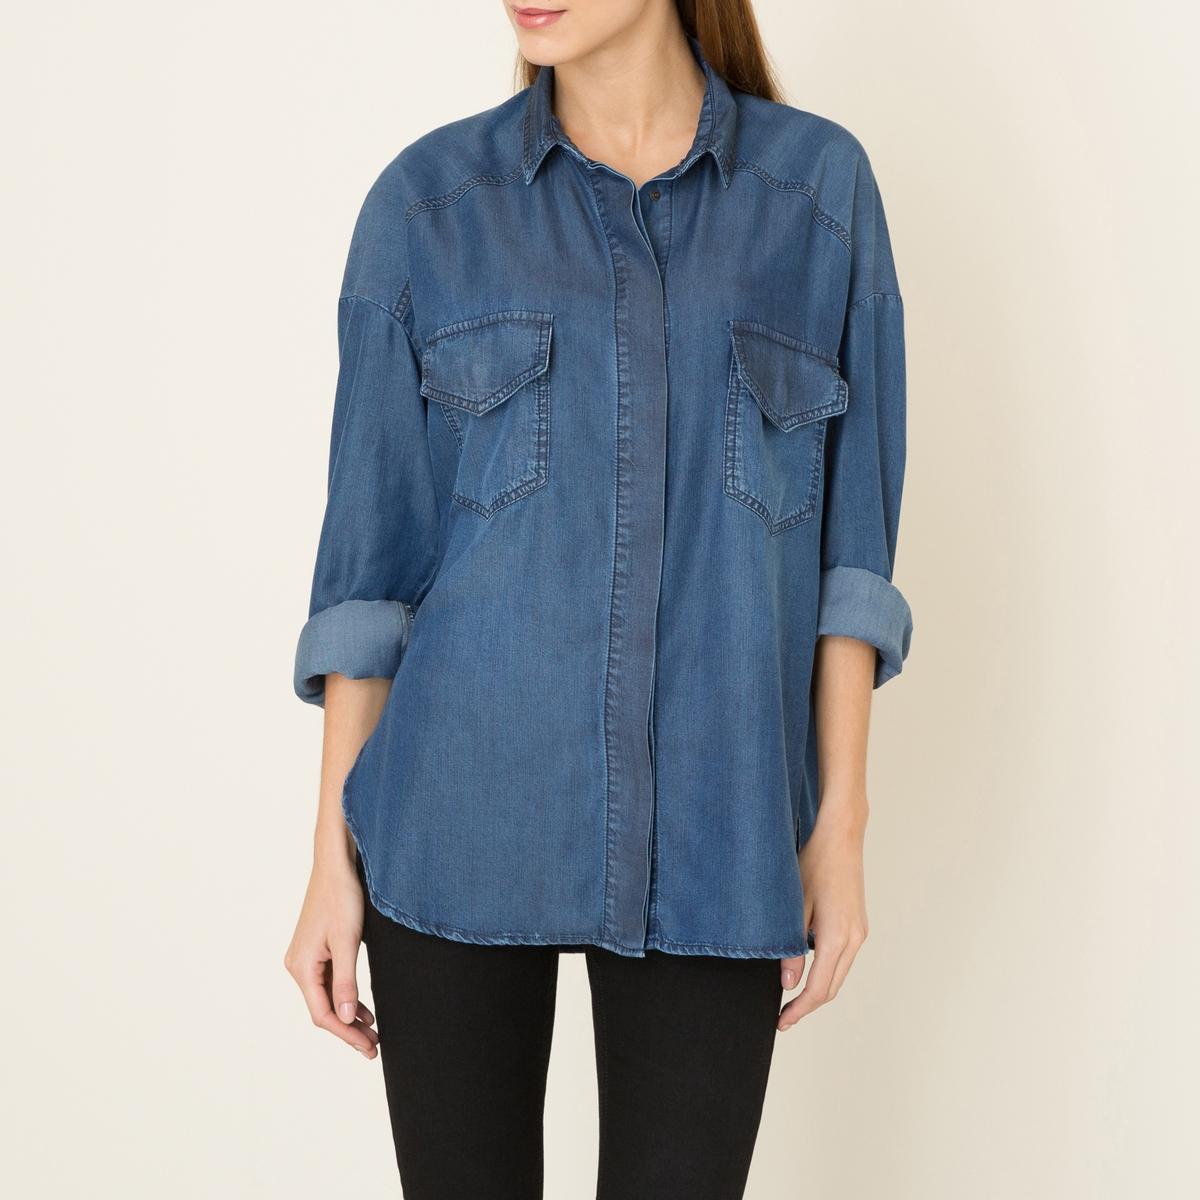 Рубашка из тенселаСостав и описание :Материал : Струящийся тенсел,  100% лиоцеллМарка : THE KOOPLES SPORT<br><br>Цвет: синий<br>Размер: XS